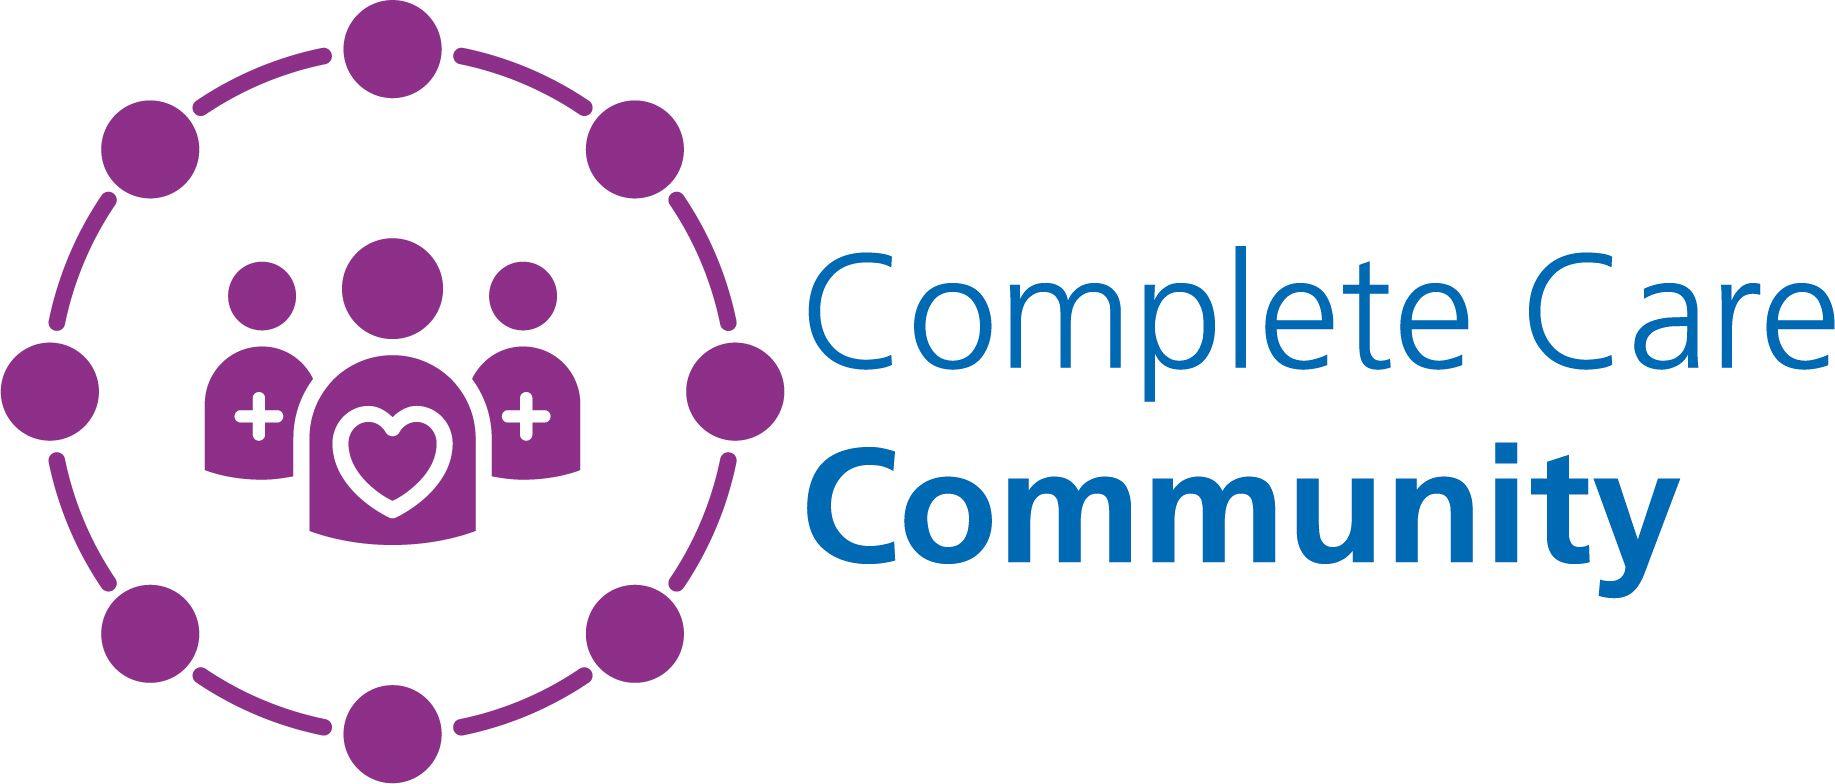 Complete Care Community